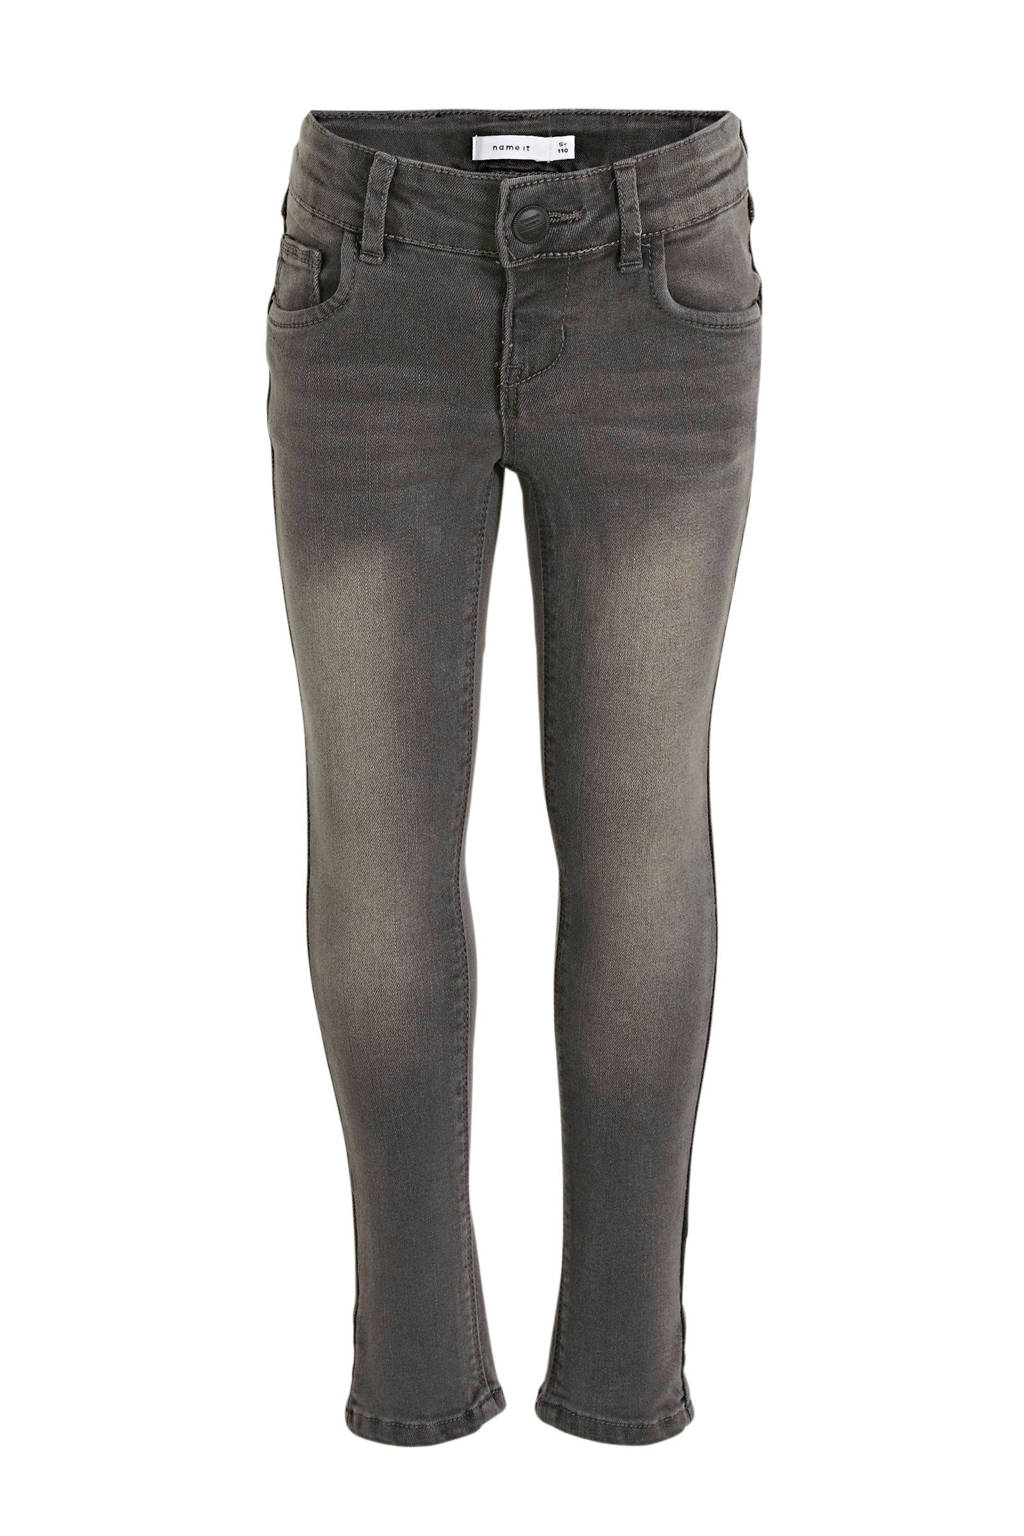 NAME IT KIDS skinn fit jeans Polly grijs stonewashed, Grijs stonewashed